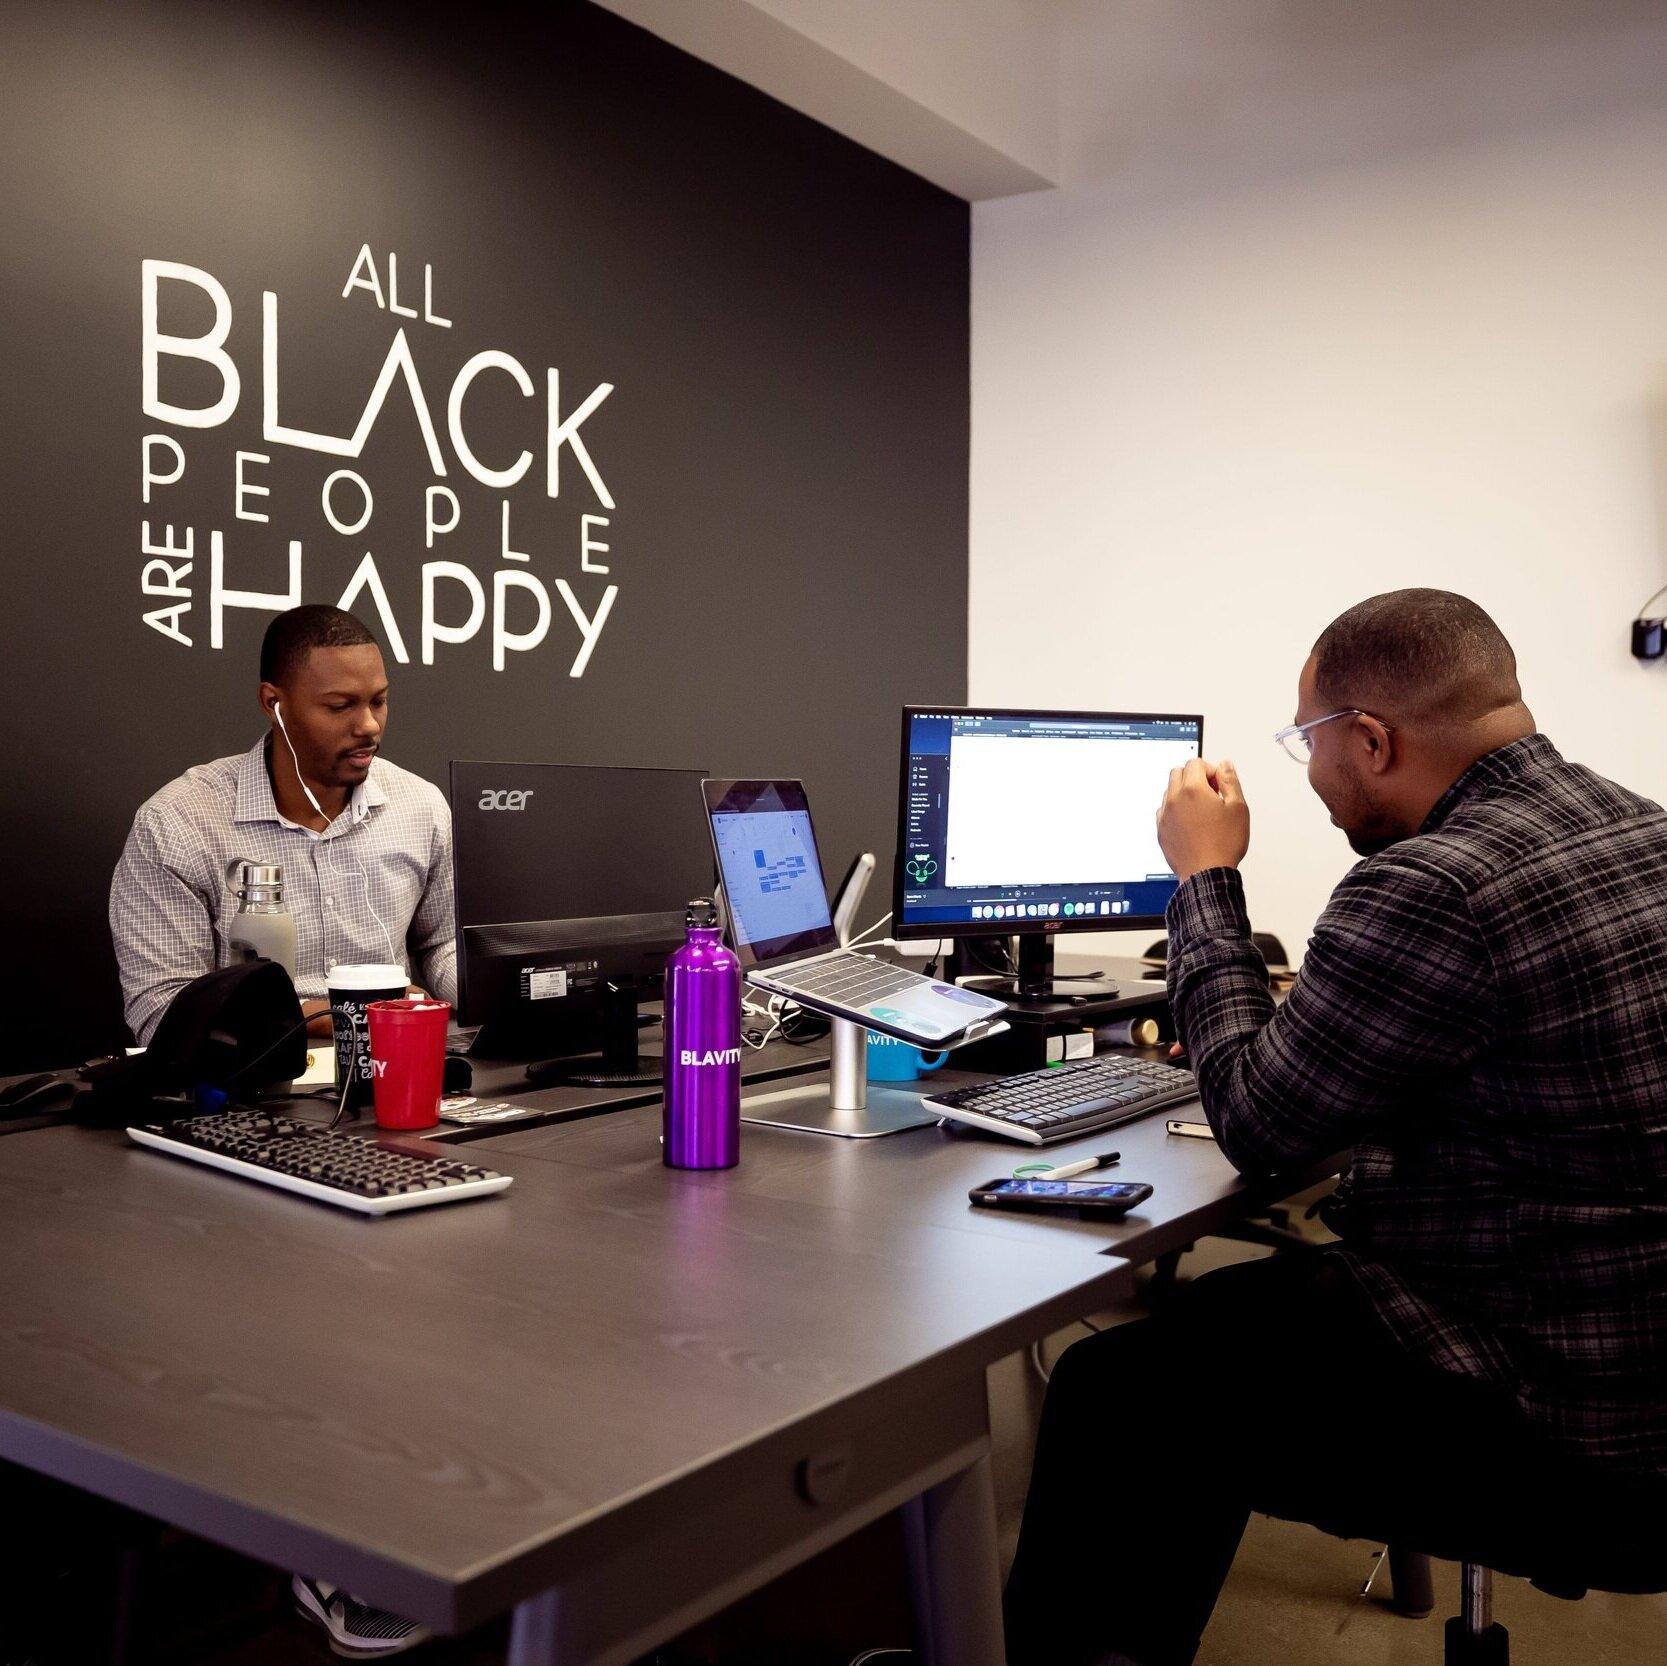 Blavity Inc Office - CarolLeeRose-81-min.jpg